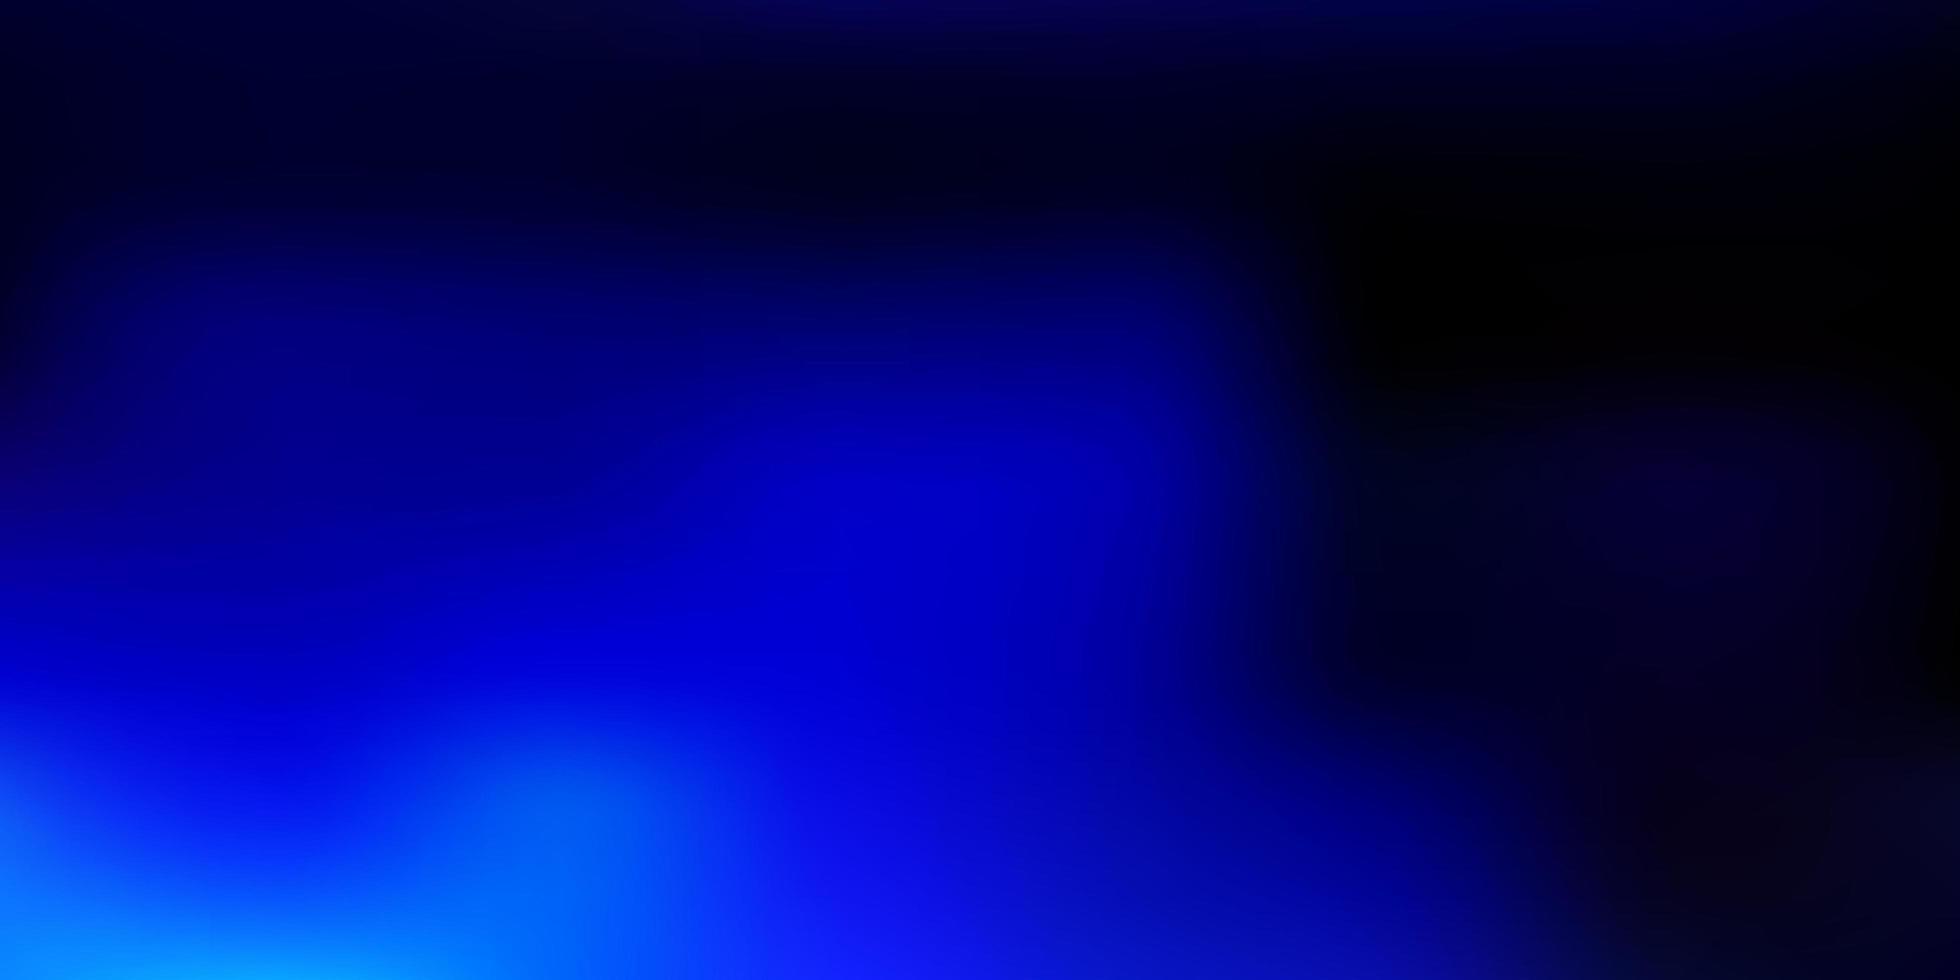 pano de fundo de desfoque de gradiente azul escuro. vetor